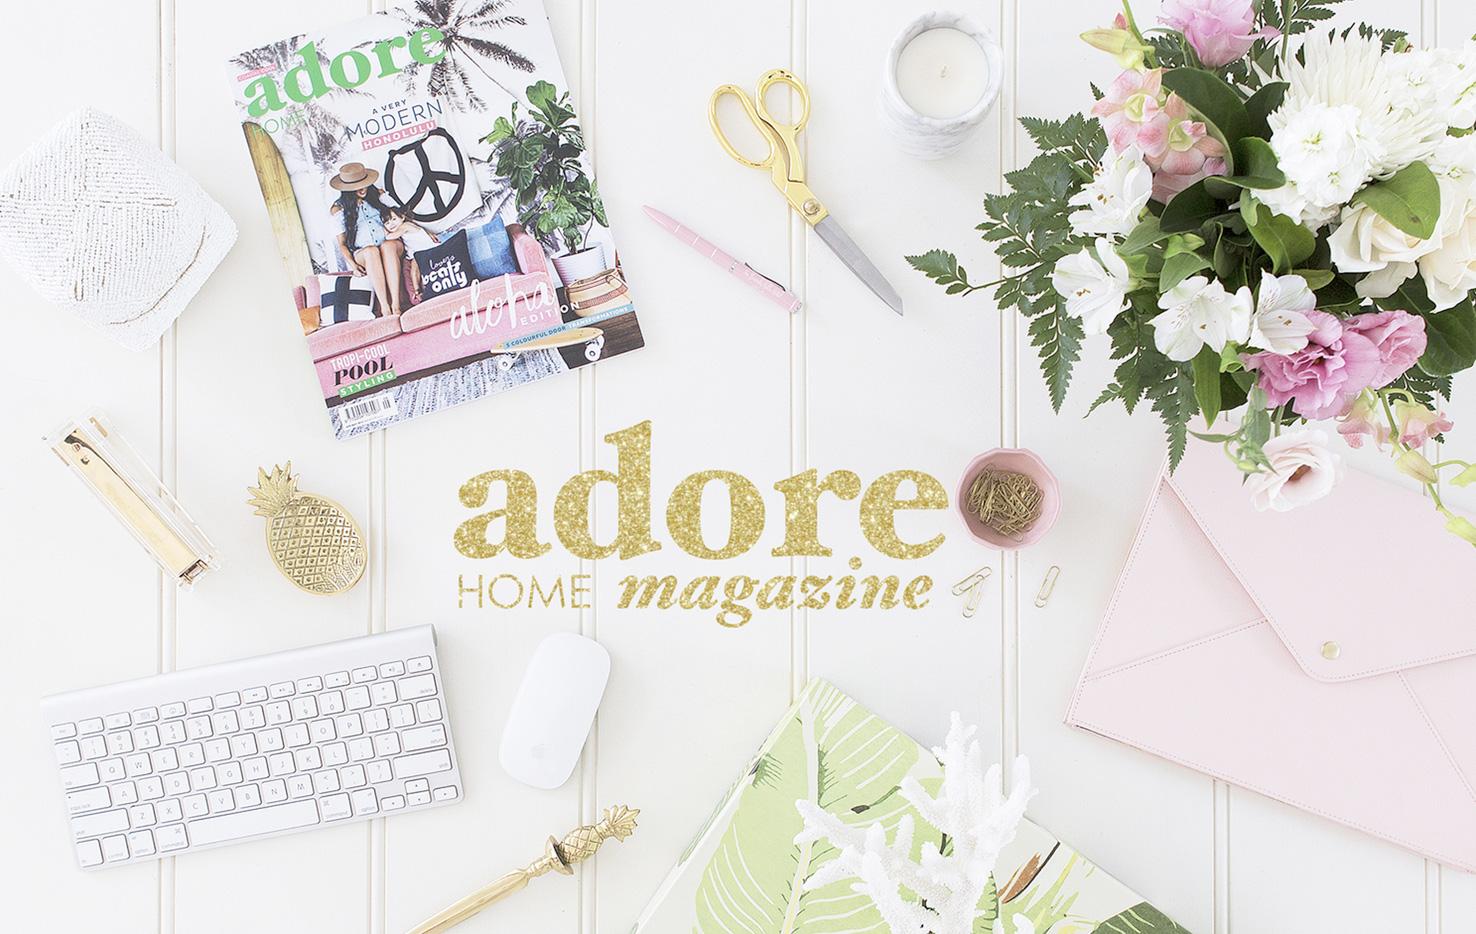 Blog_Lifestyle_AdoreMag17_AlohaModern_01